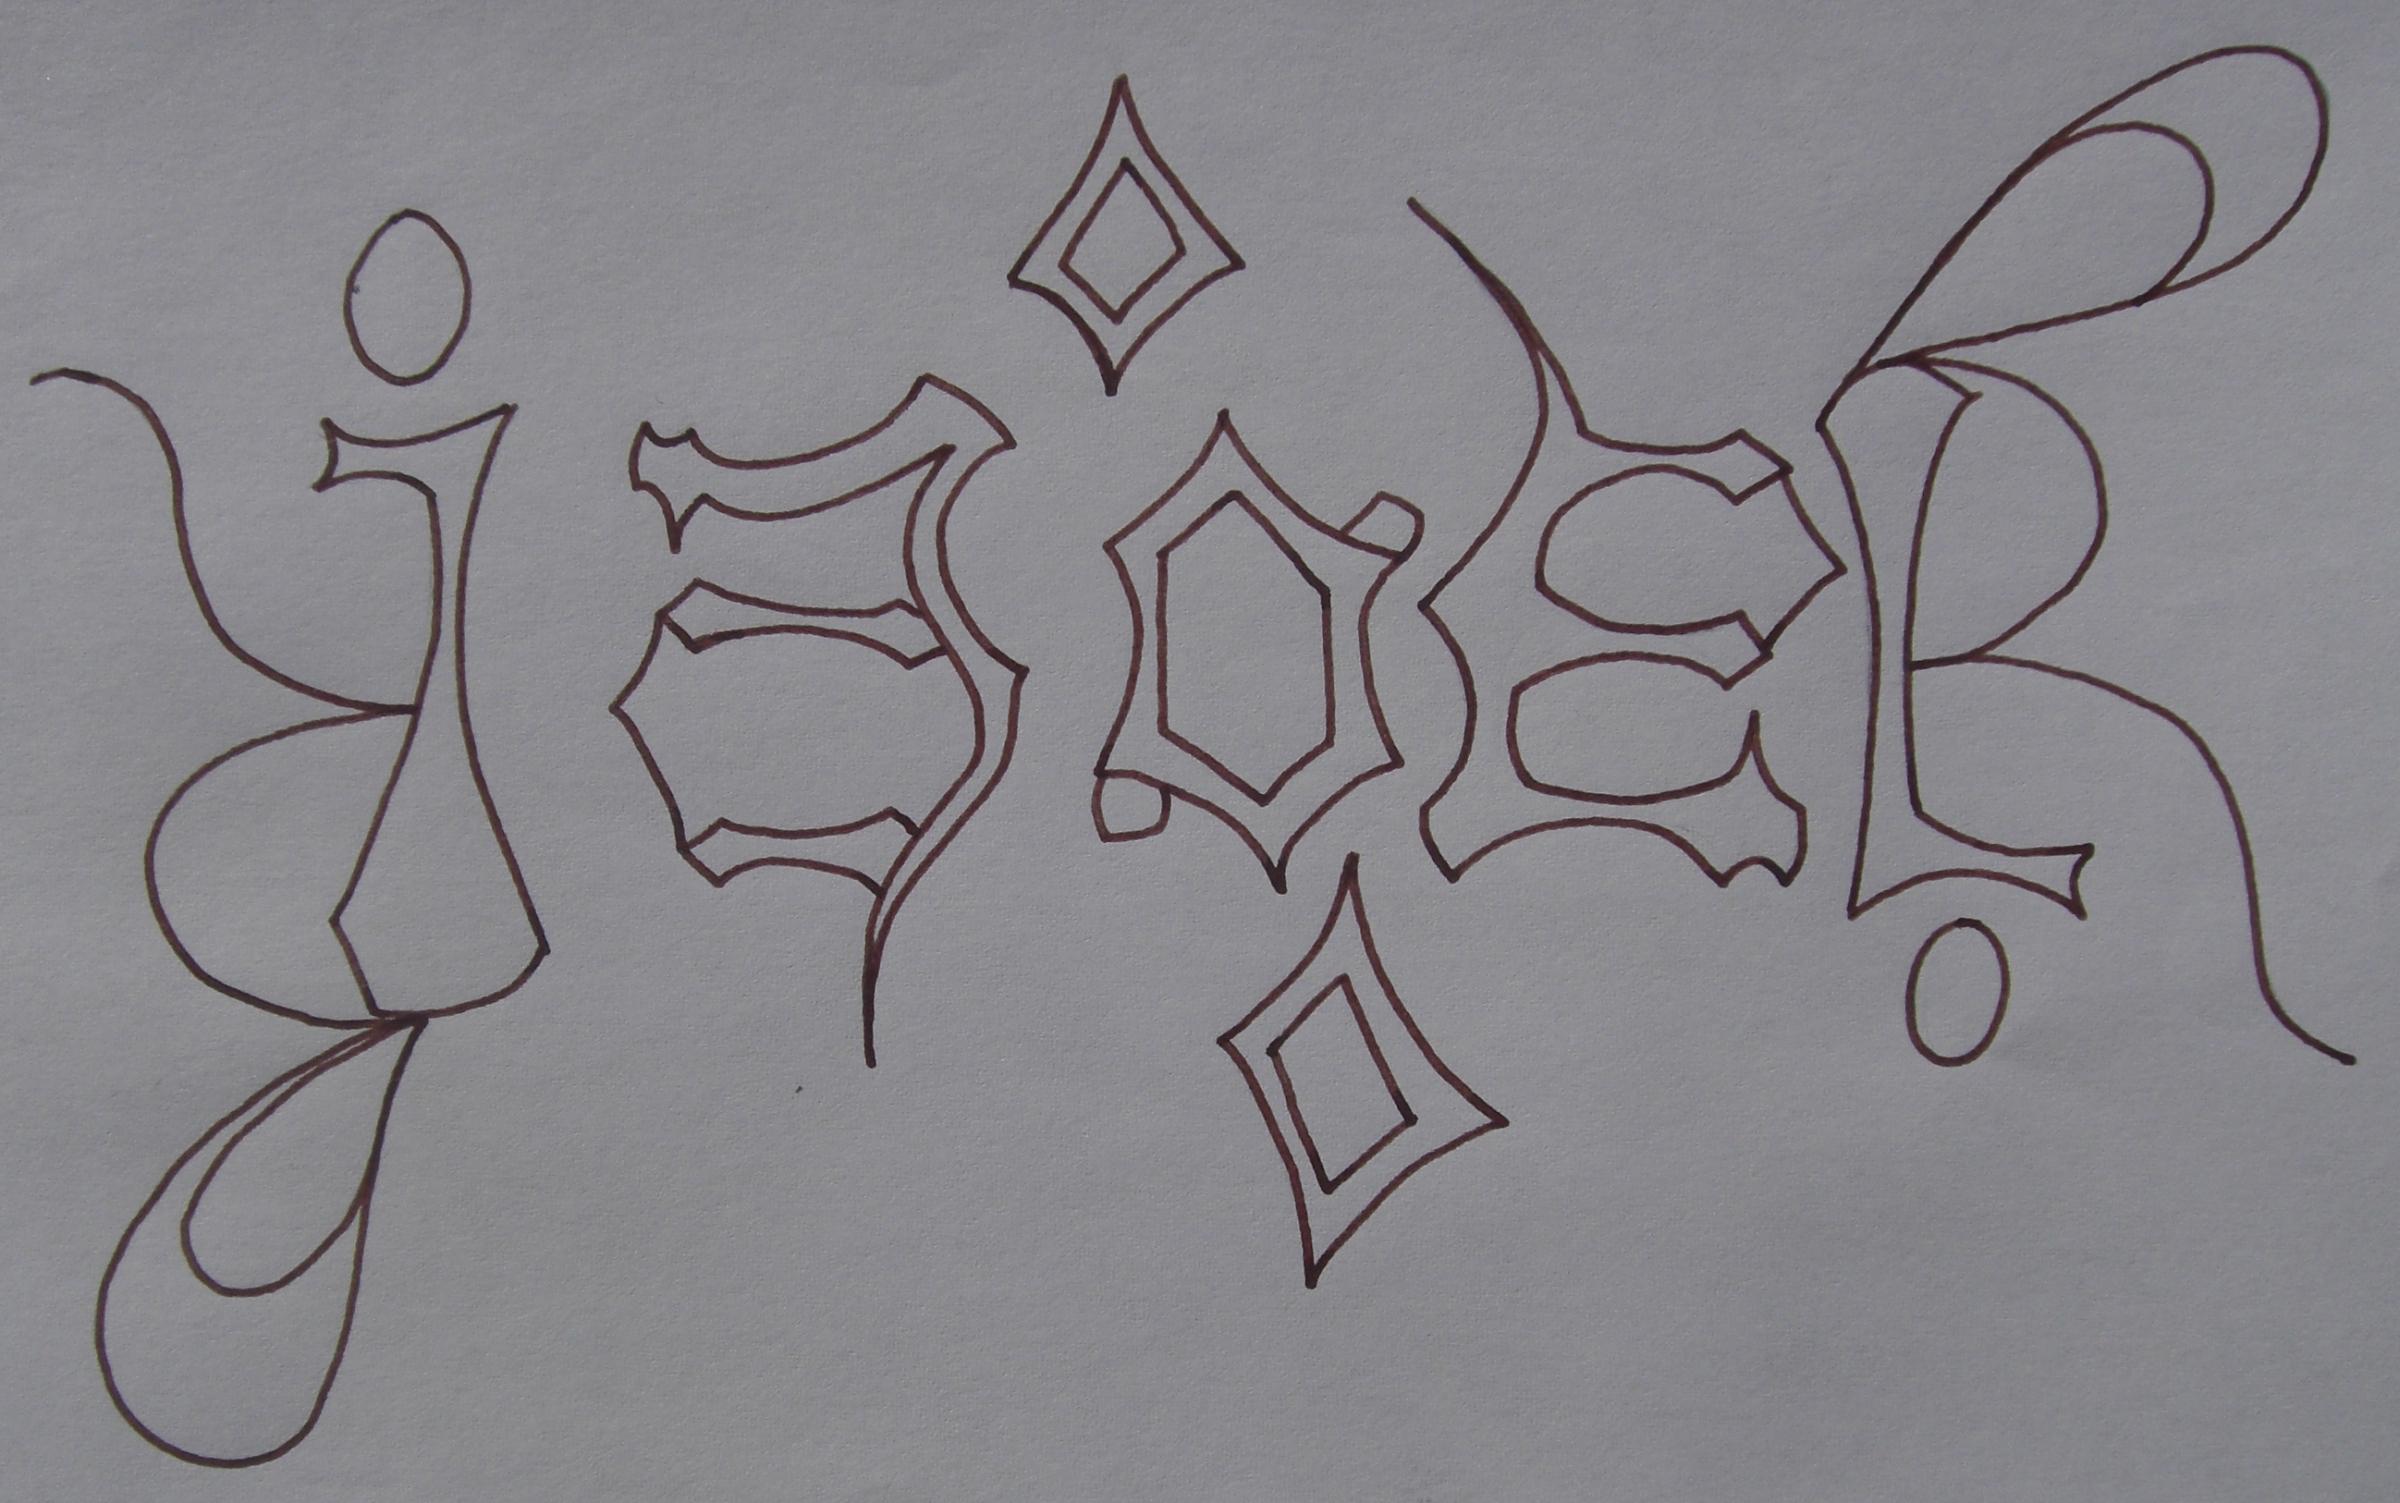 jager ambigram